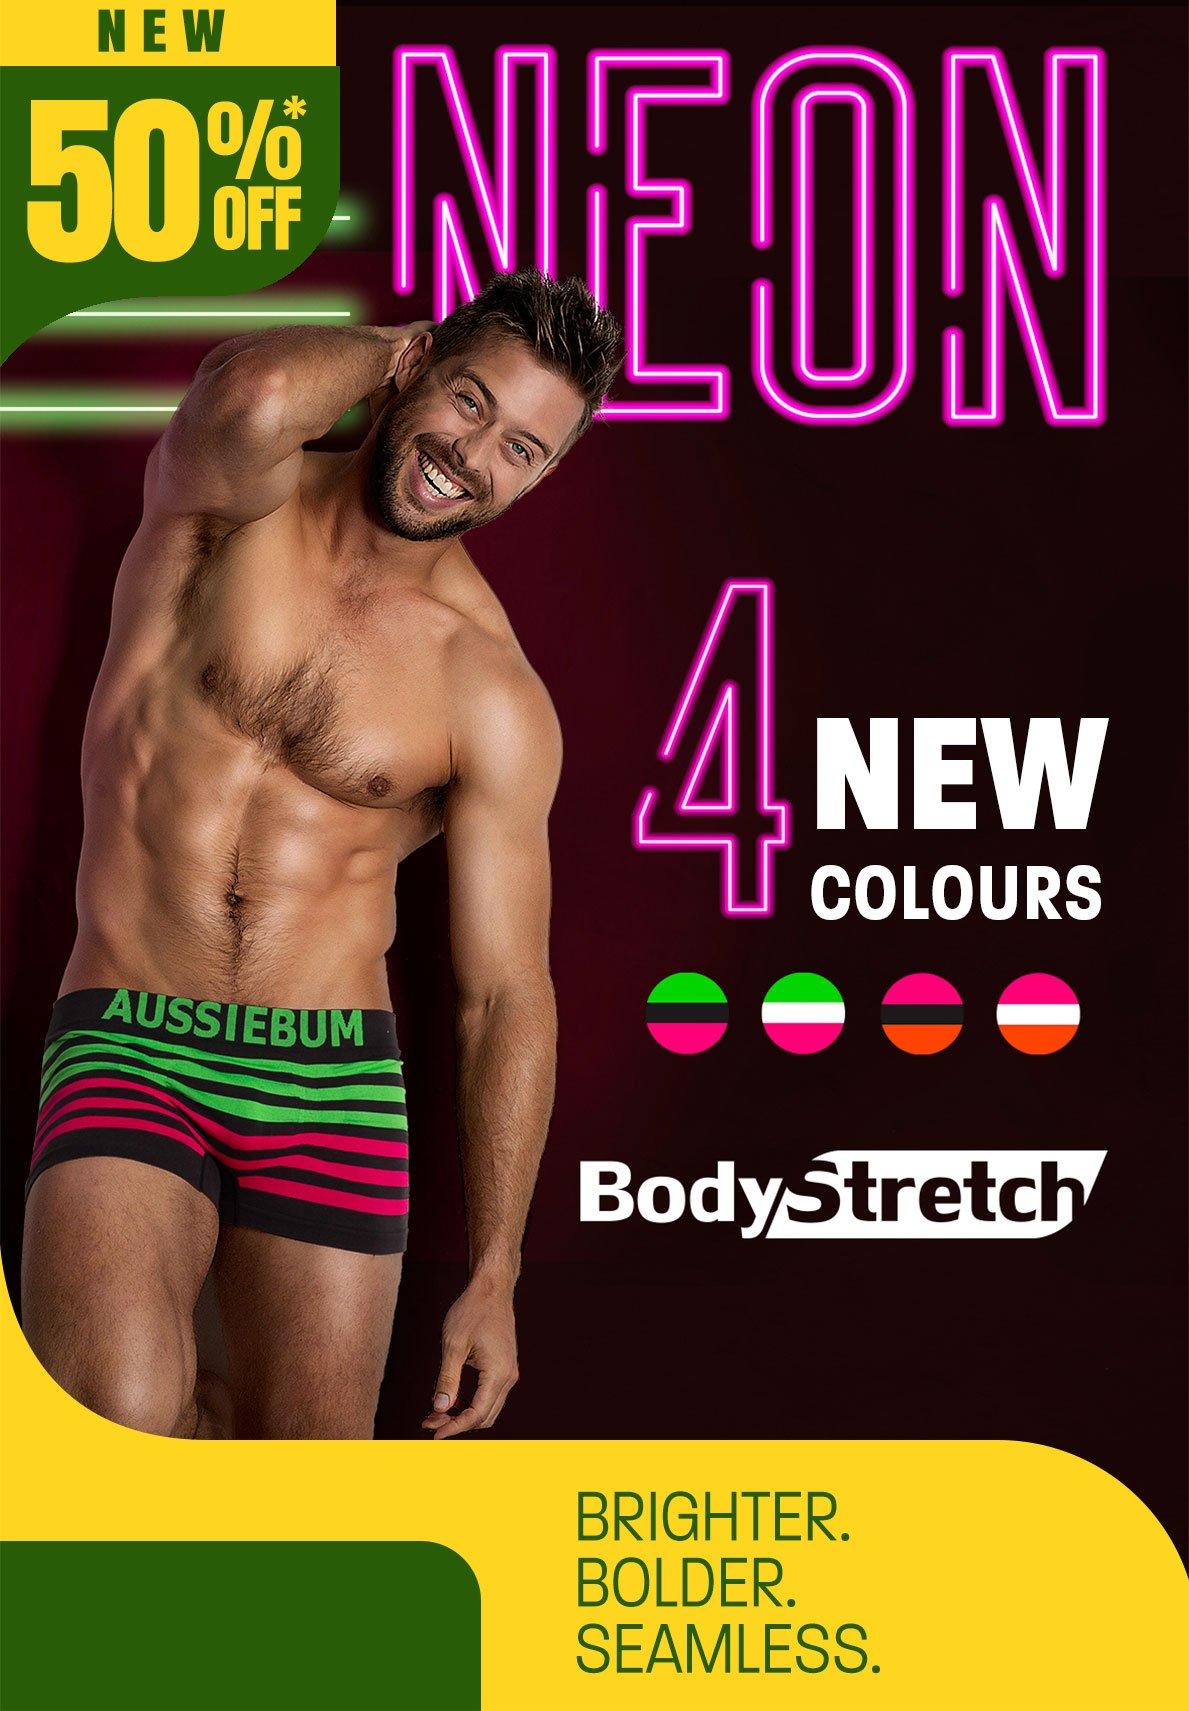 Bodystretch Black Green Homepage Image